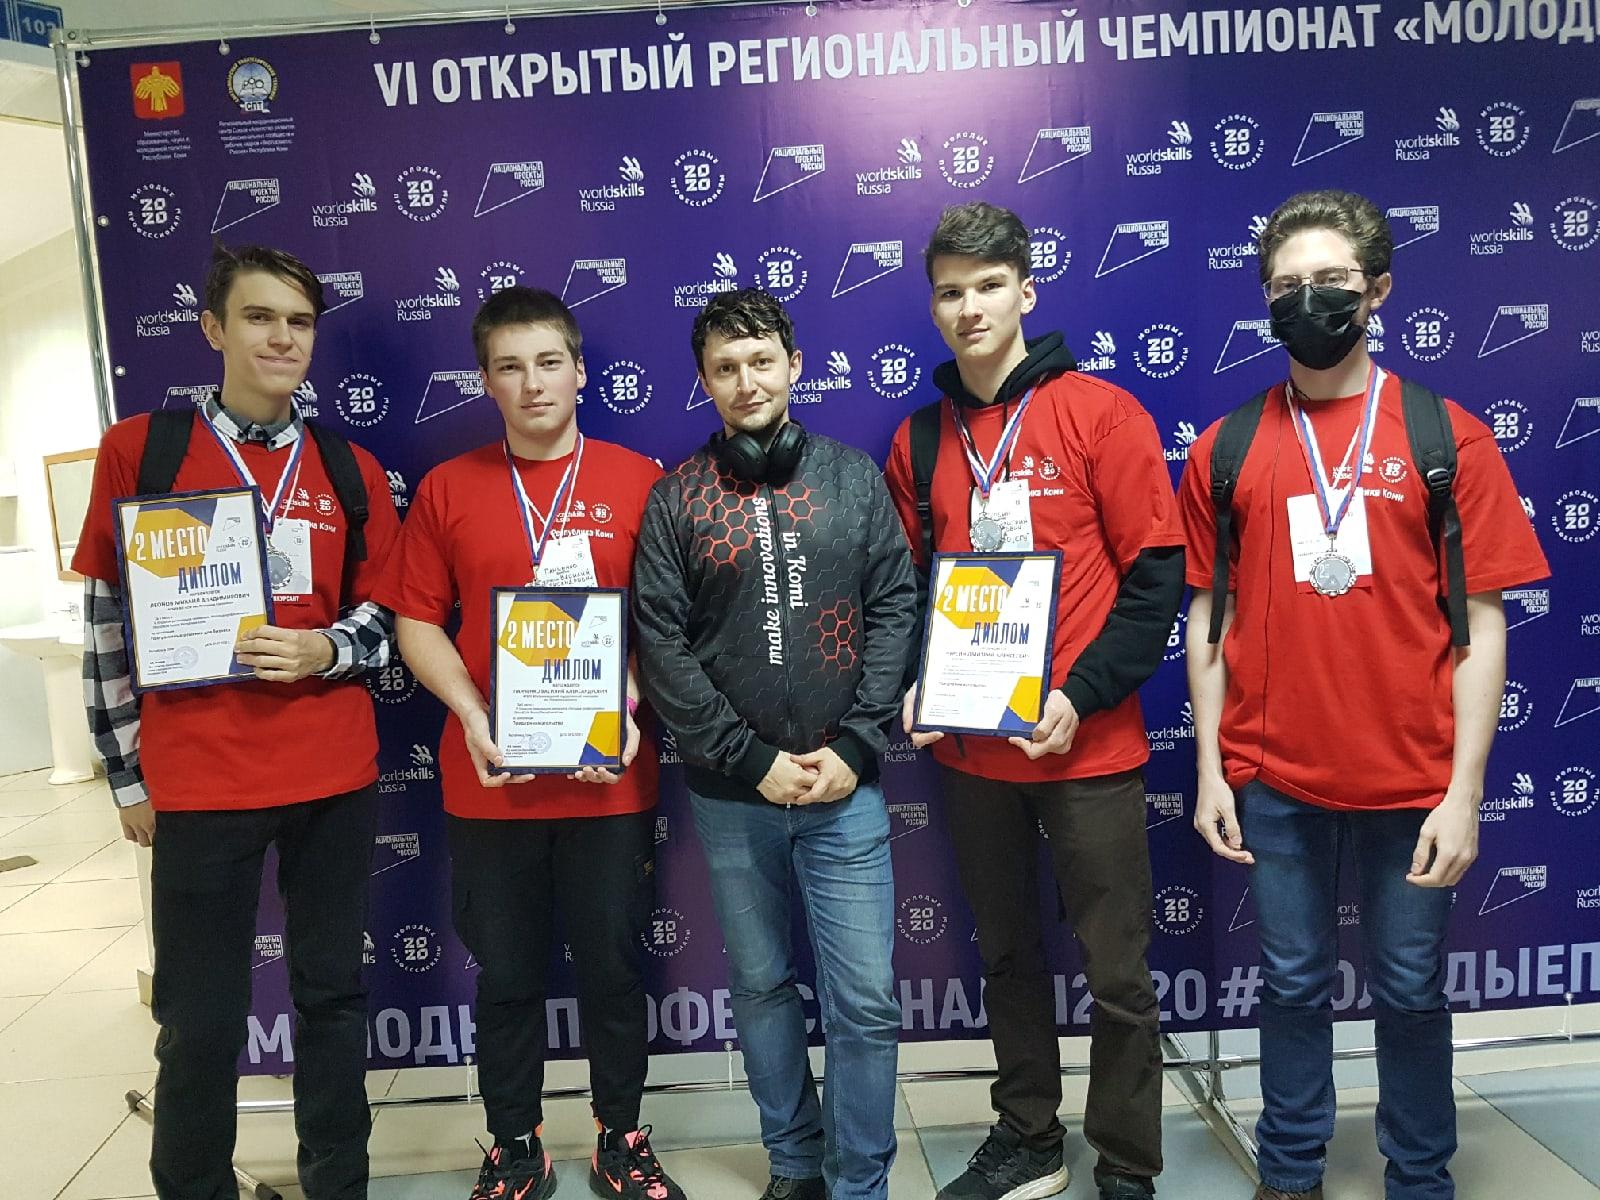 Проект ComicsOn – медалист регионального чемпионата WorldSkills